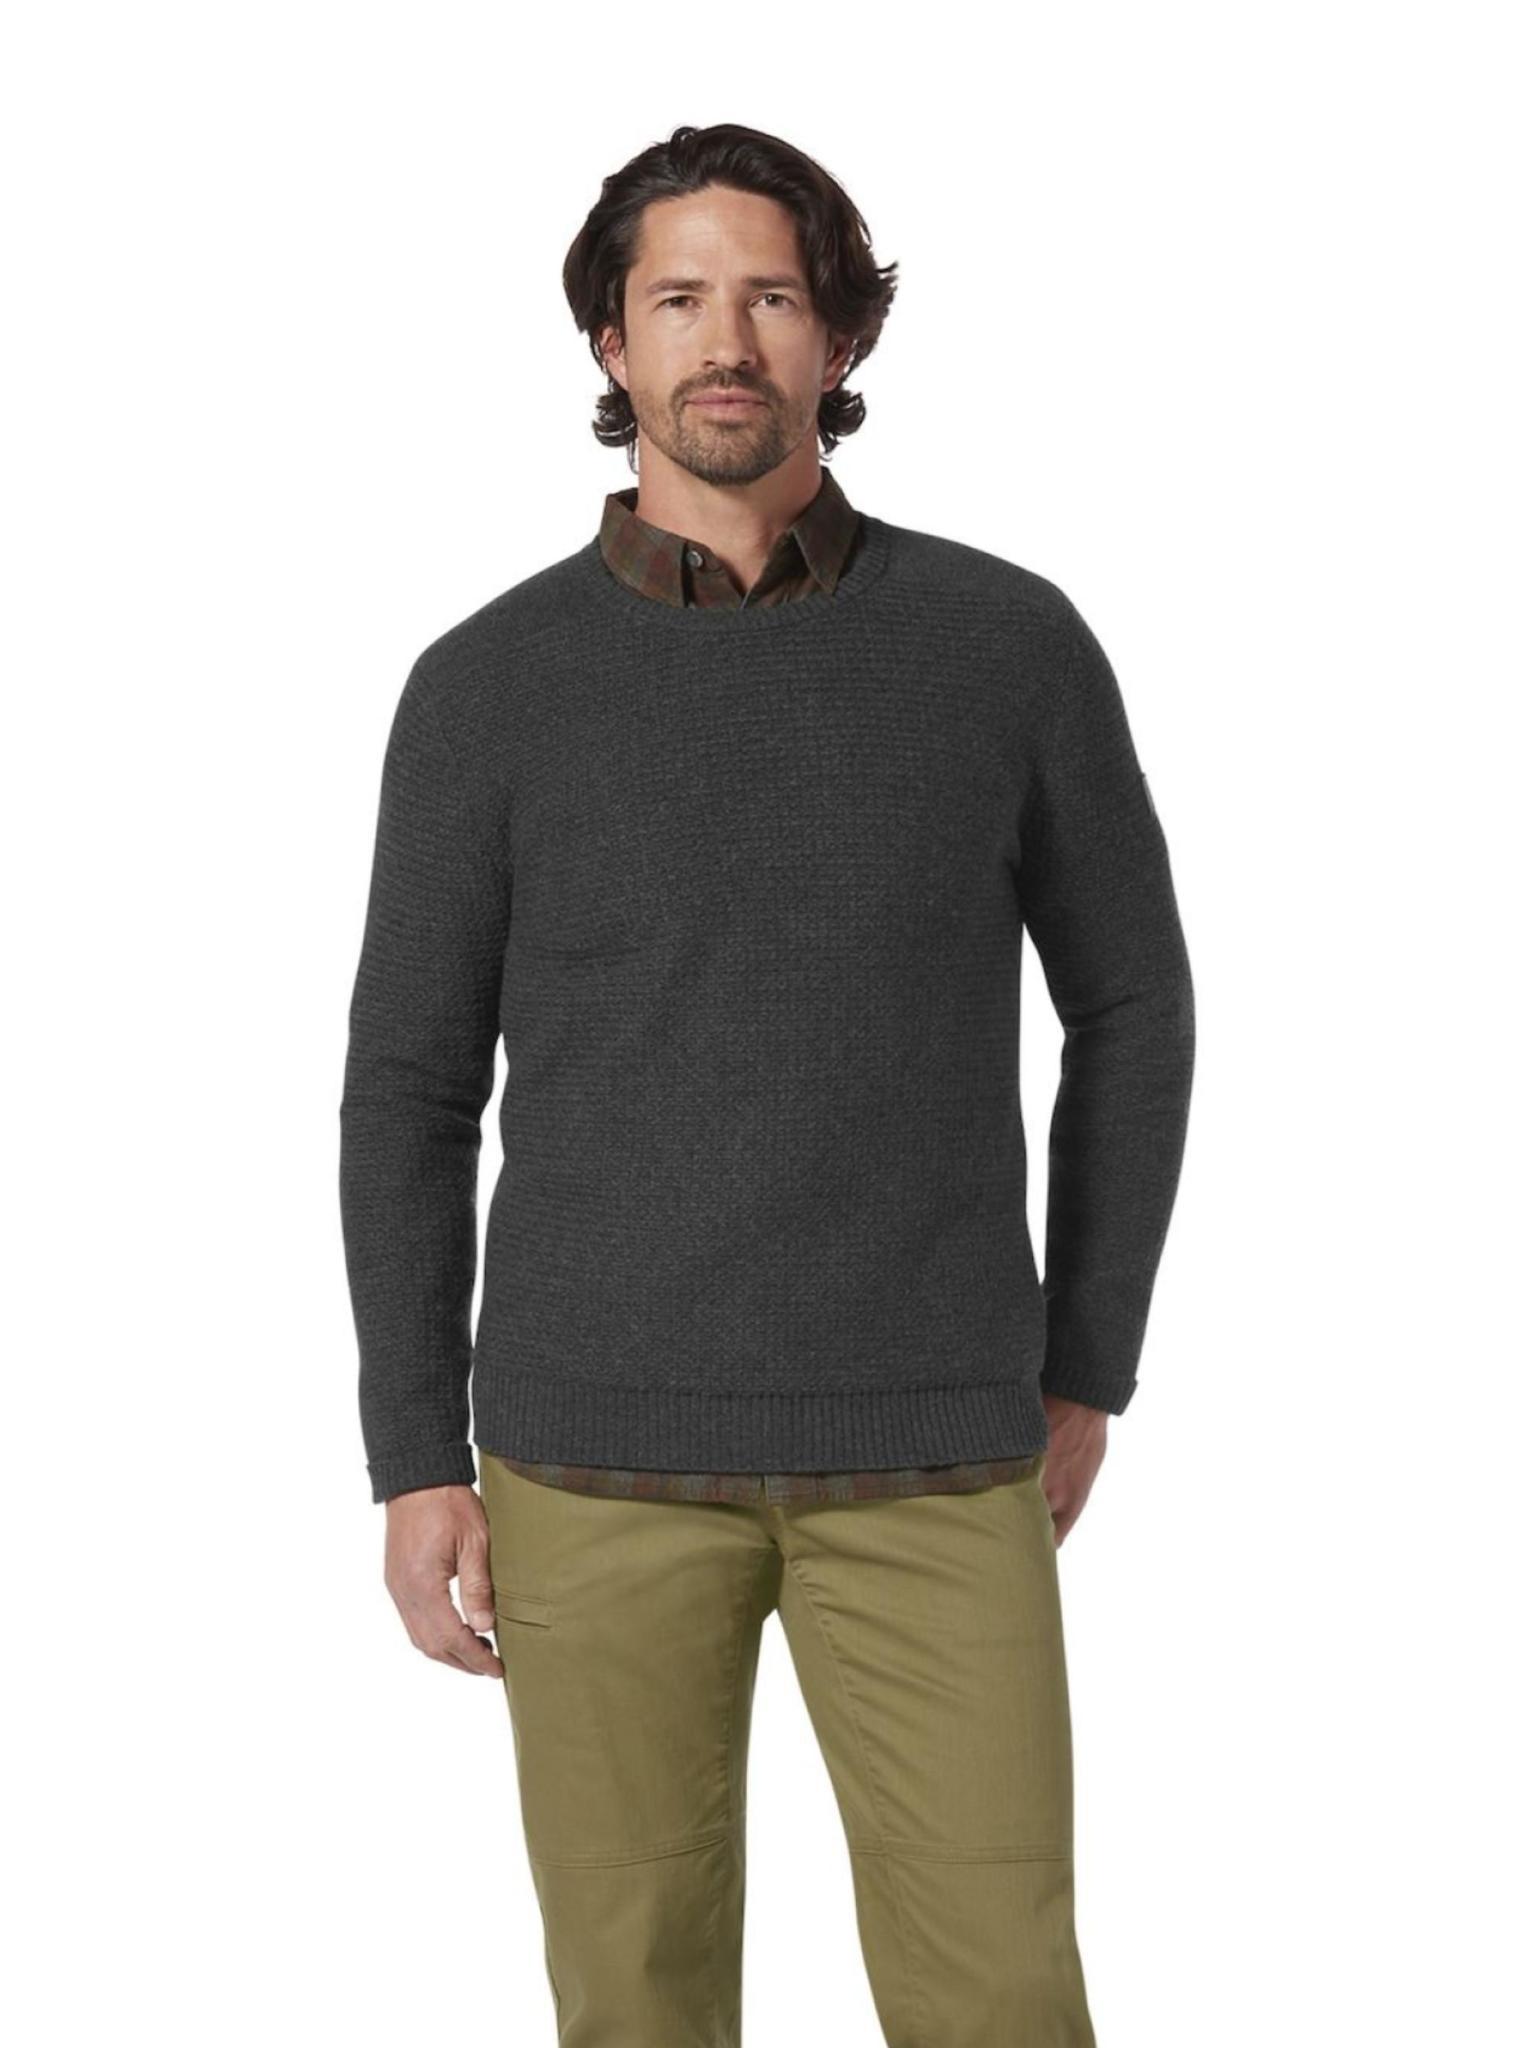 Royal Robbins Men's All Season Merino Sweater